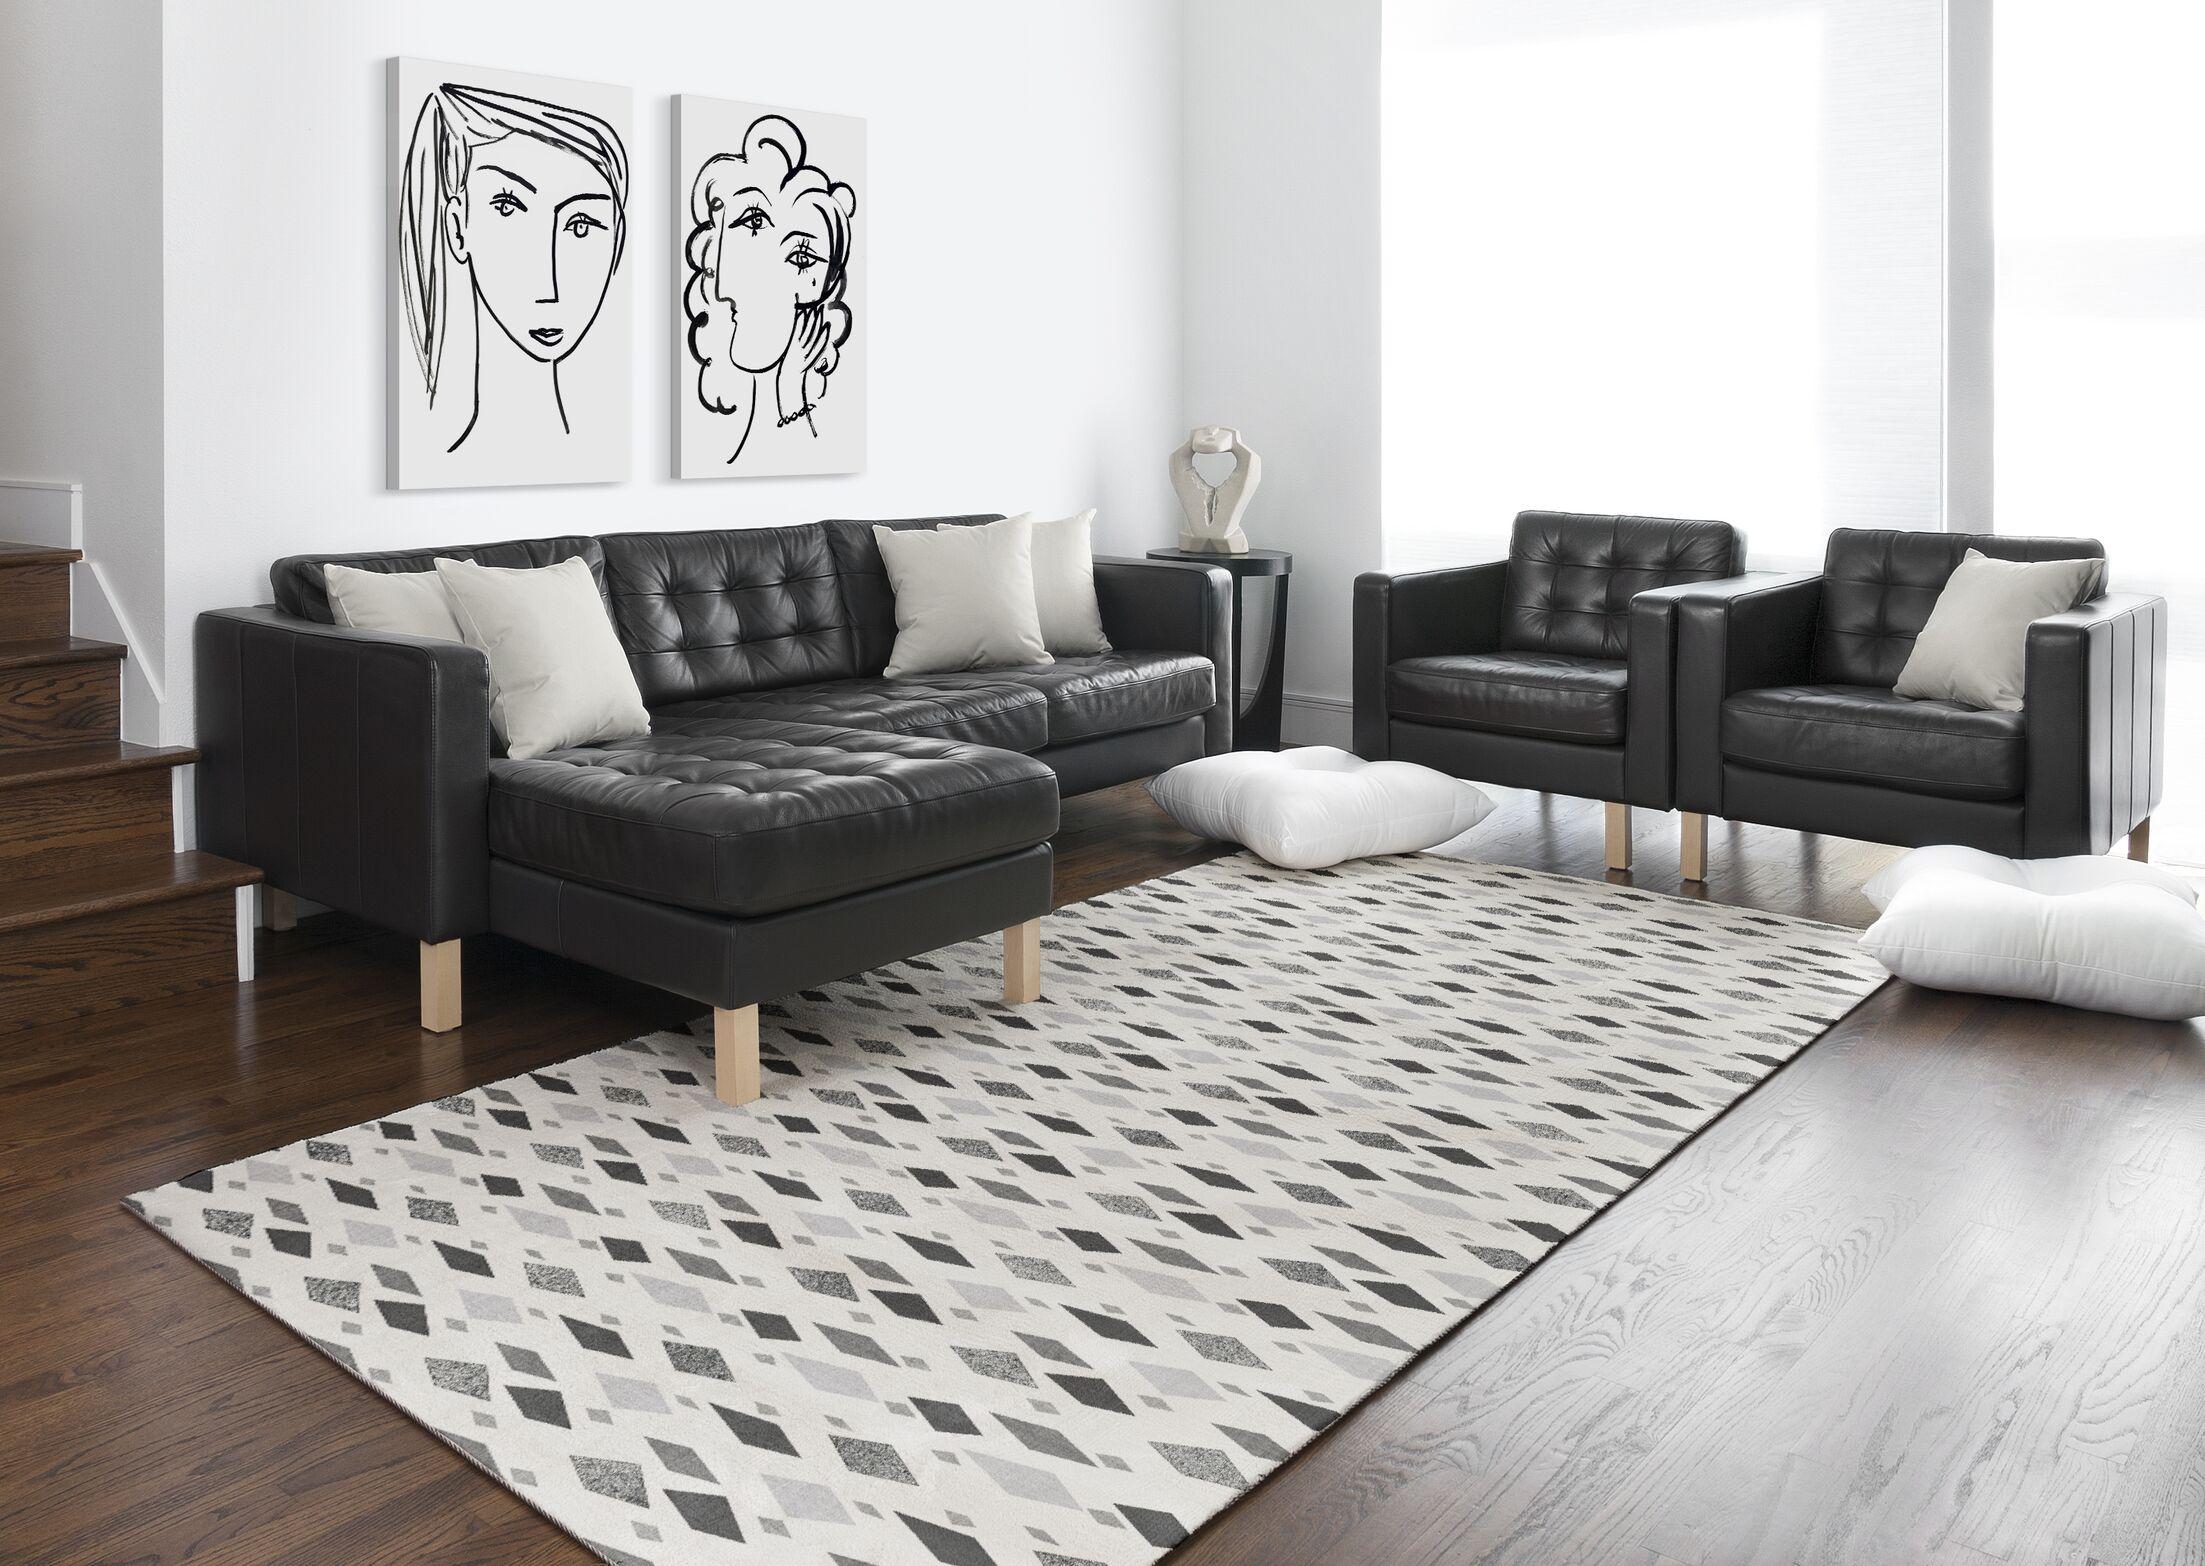 Bouchard Gray Area Rug Rug Size: Rectangle 5' x 7'